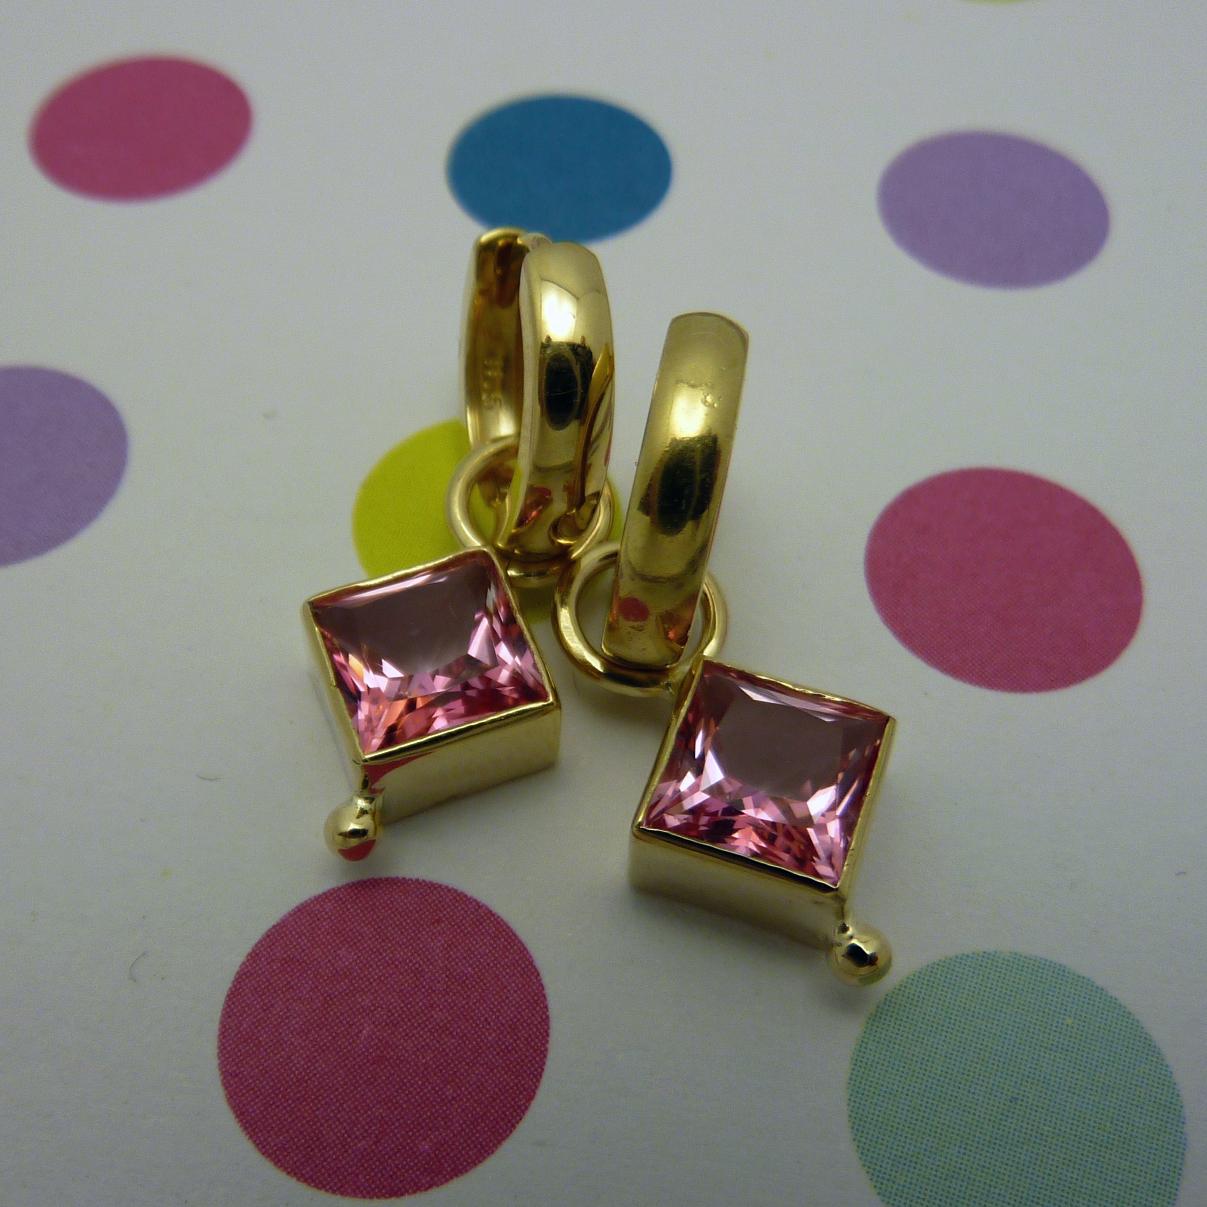 GISELE - pink topaz 14k enhancers and hoops (4).JPG